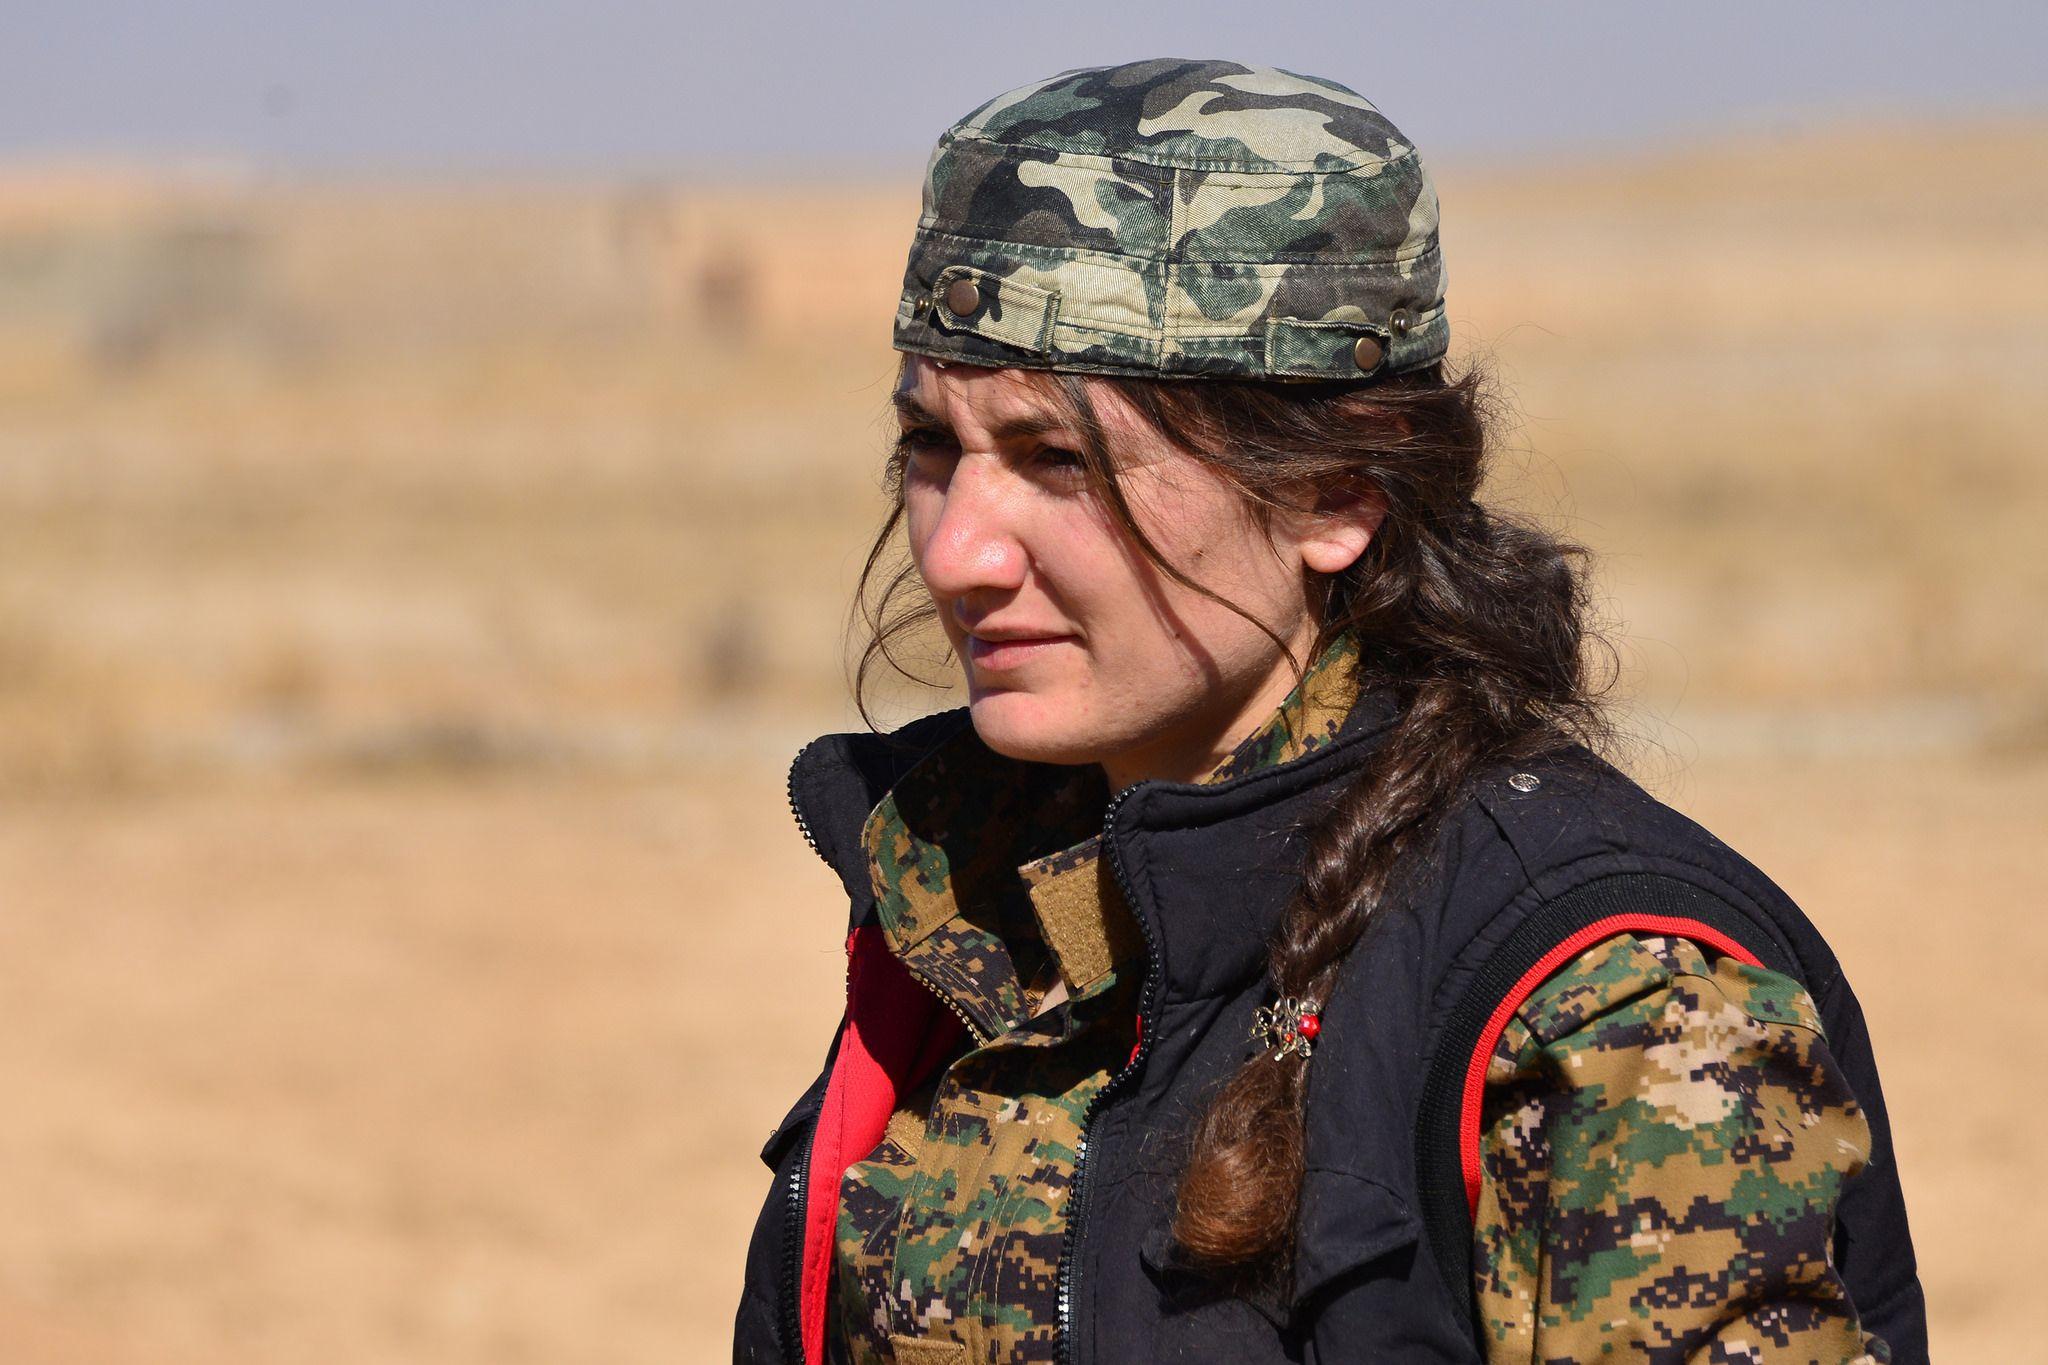 kurdish-fukgirl-nude-the-woods